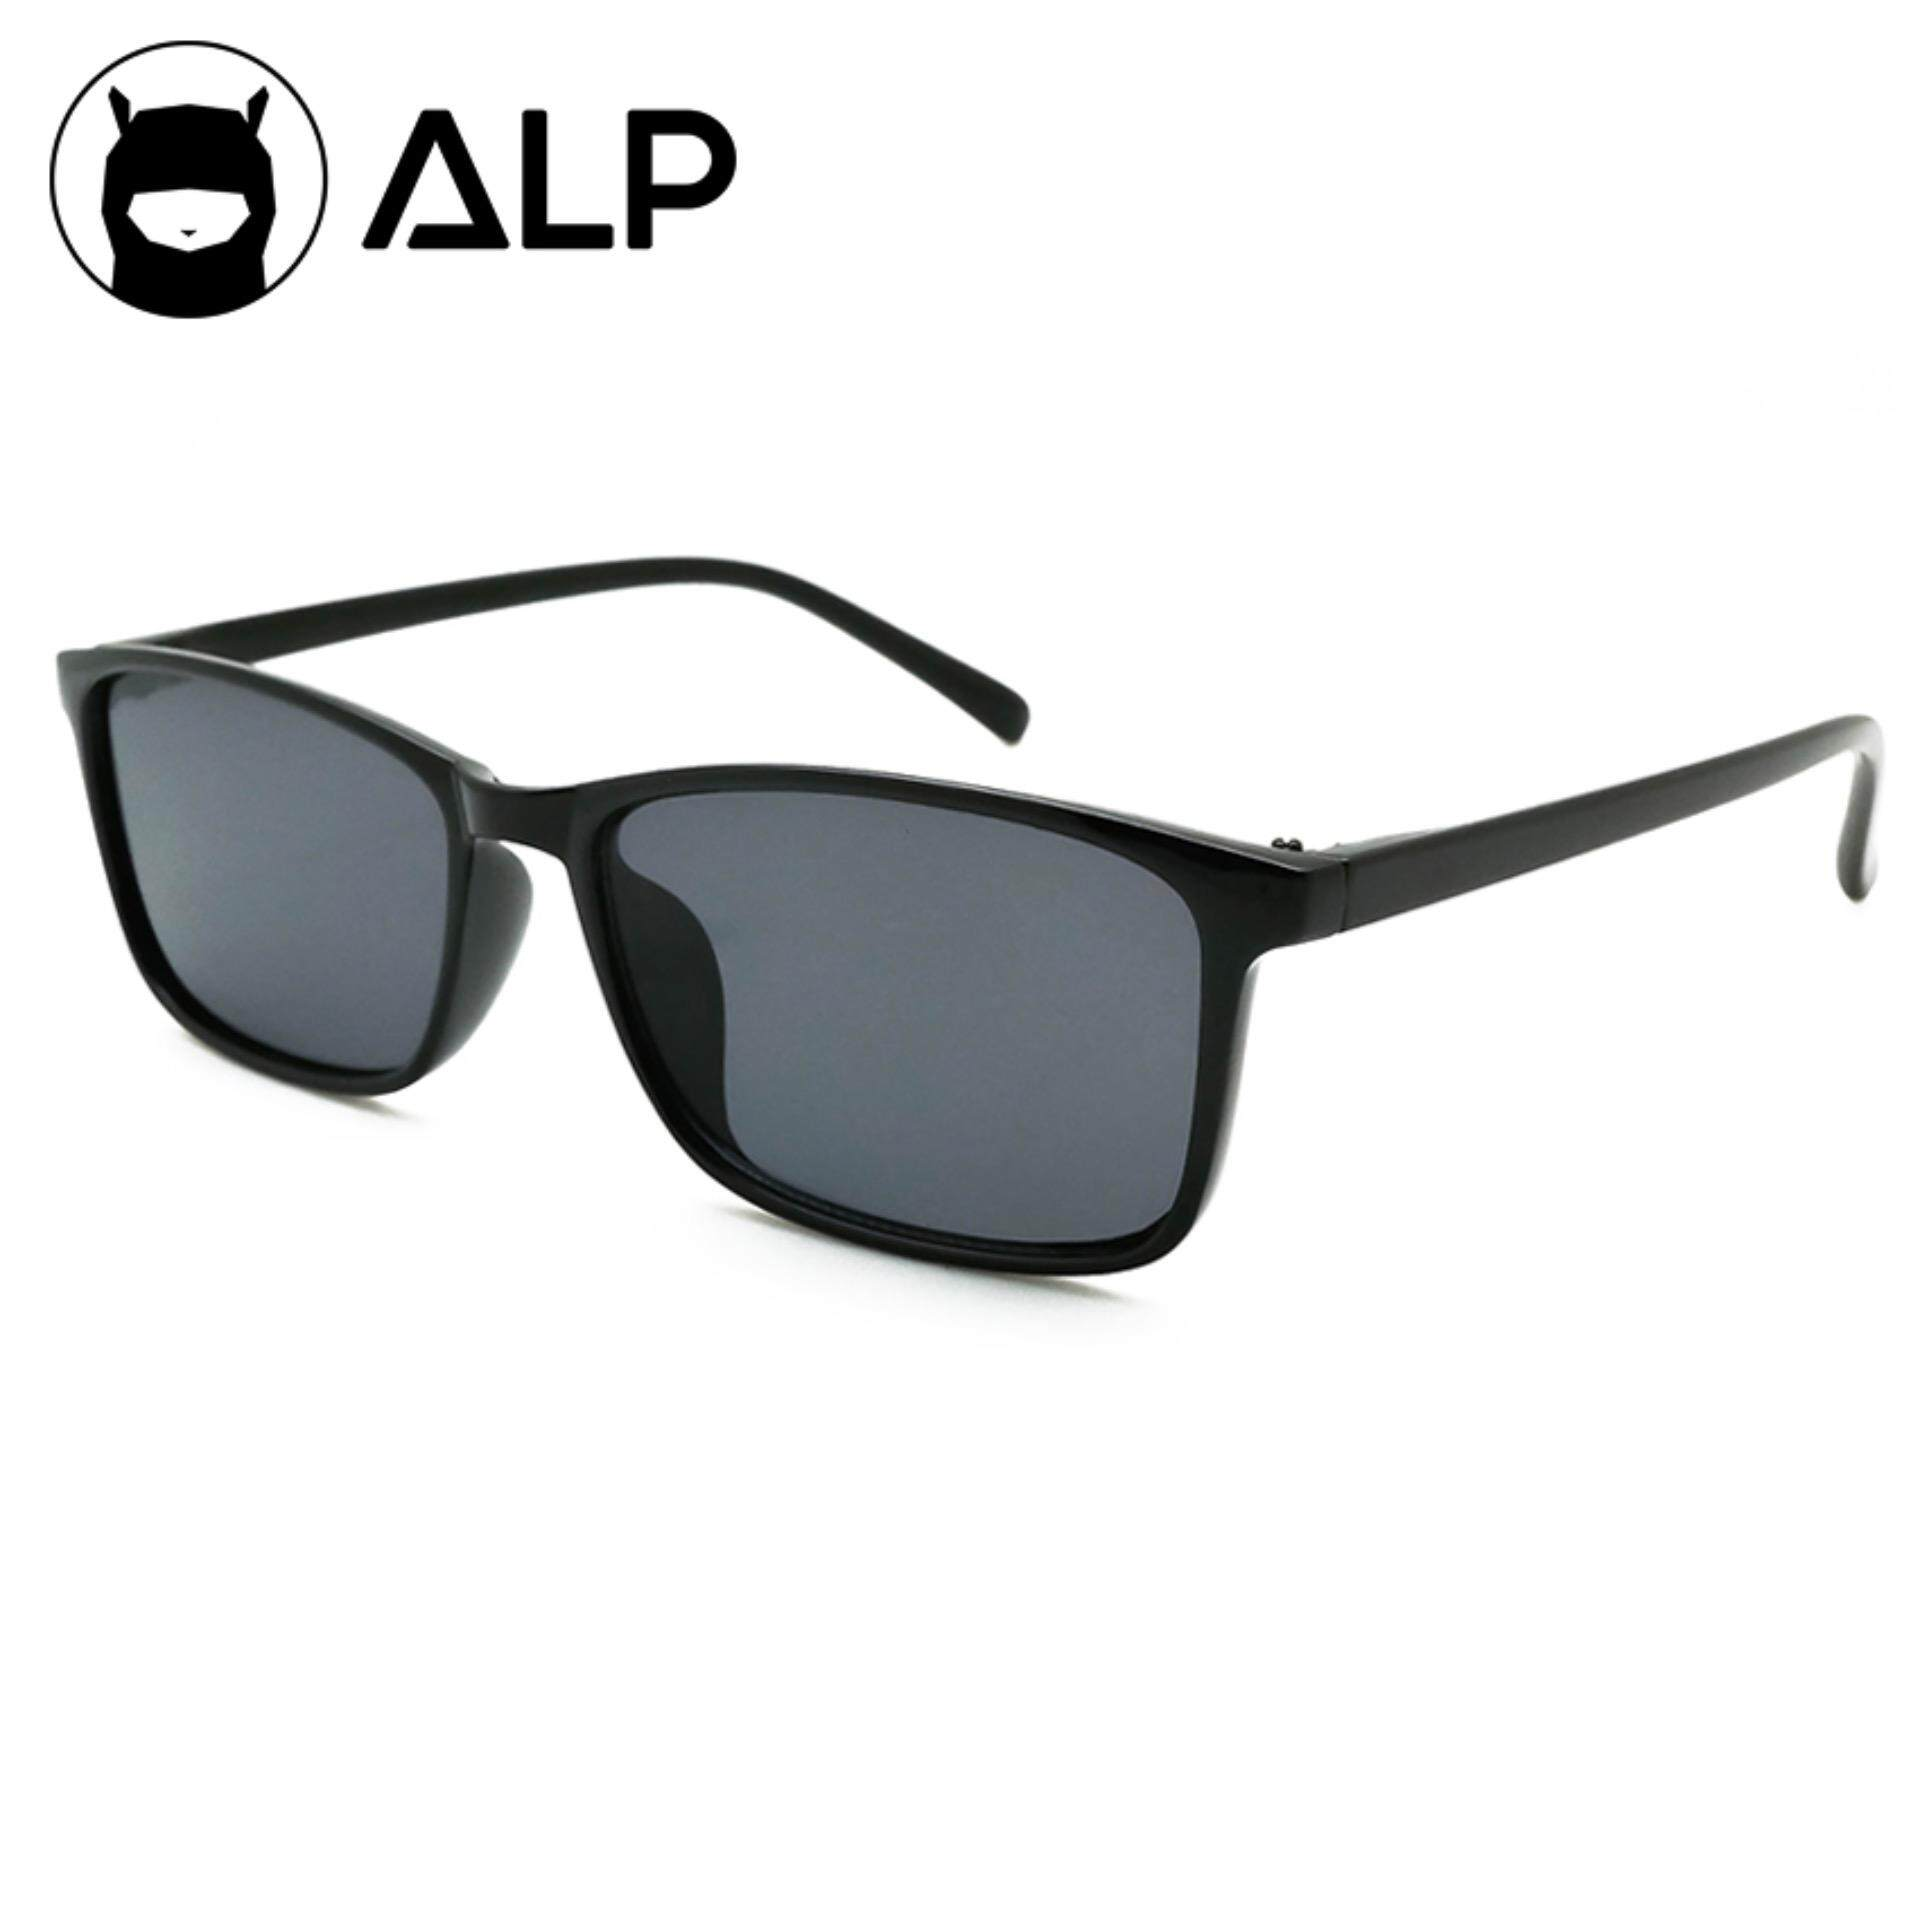 ALP Sunglasses แว่นกันแดด กัน UV 400 Square Style รุ่น ALP-0114